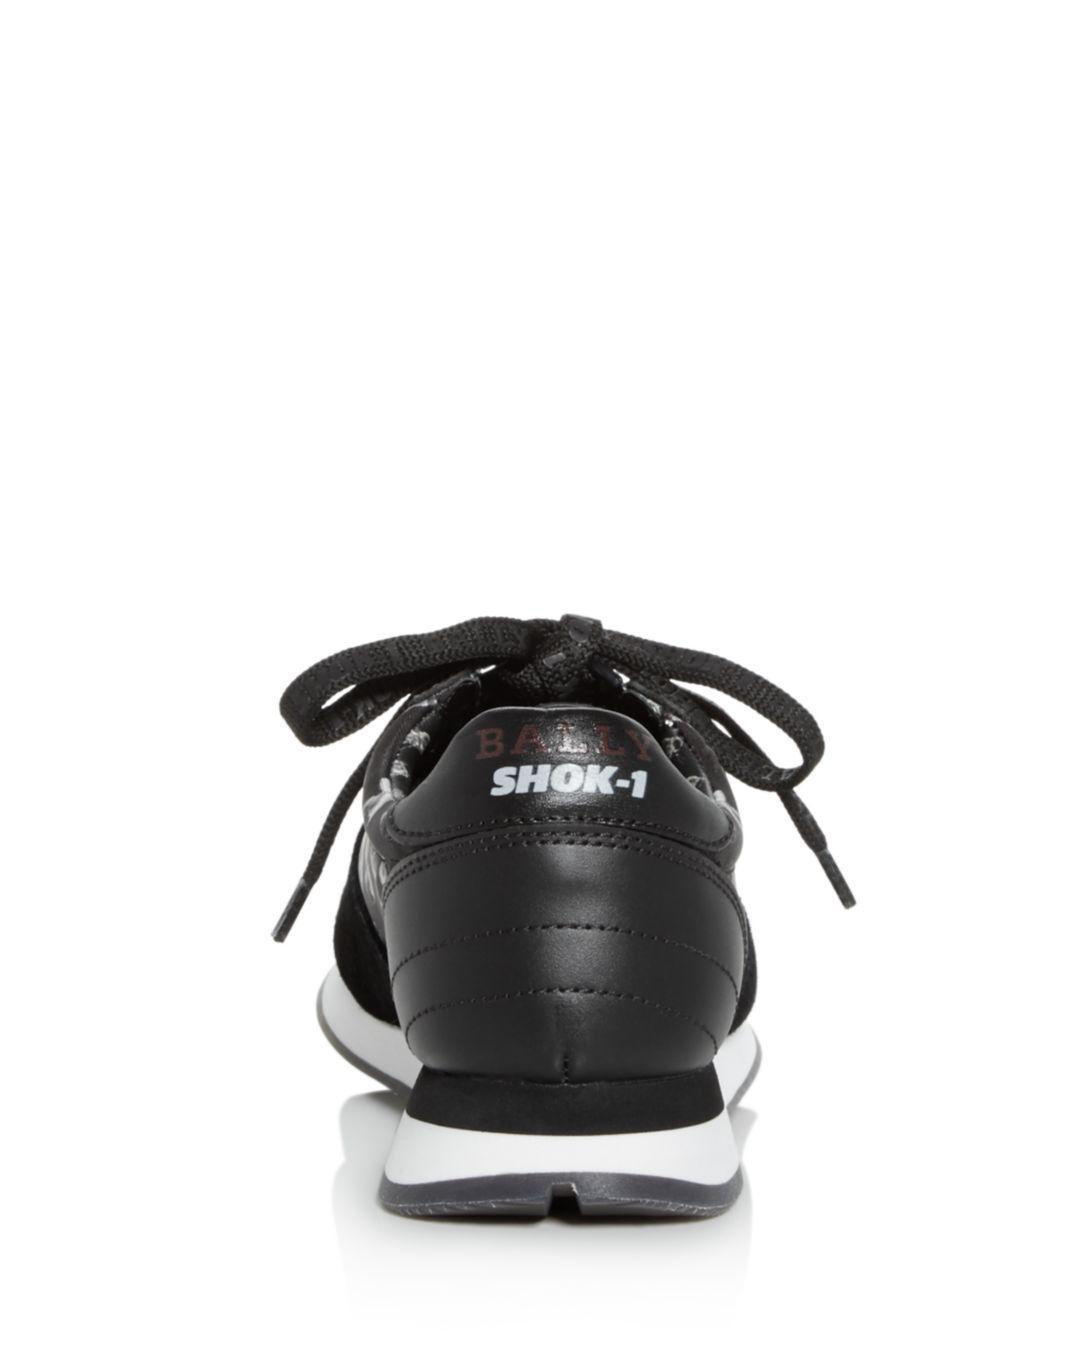 8281241bf75 Bally X Swizz Beatz Women s Gavino The Consumer Low-top Sneakers in Black -  Lyst